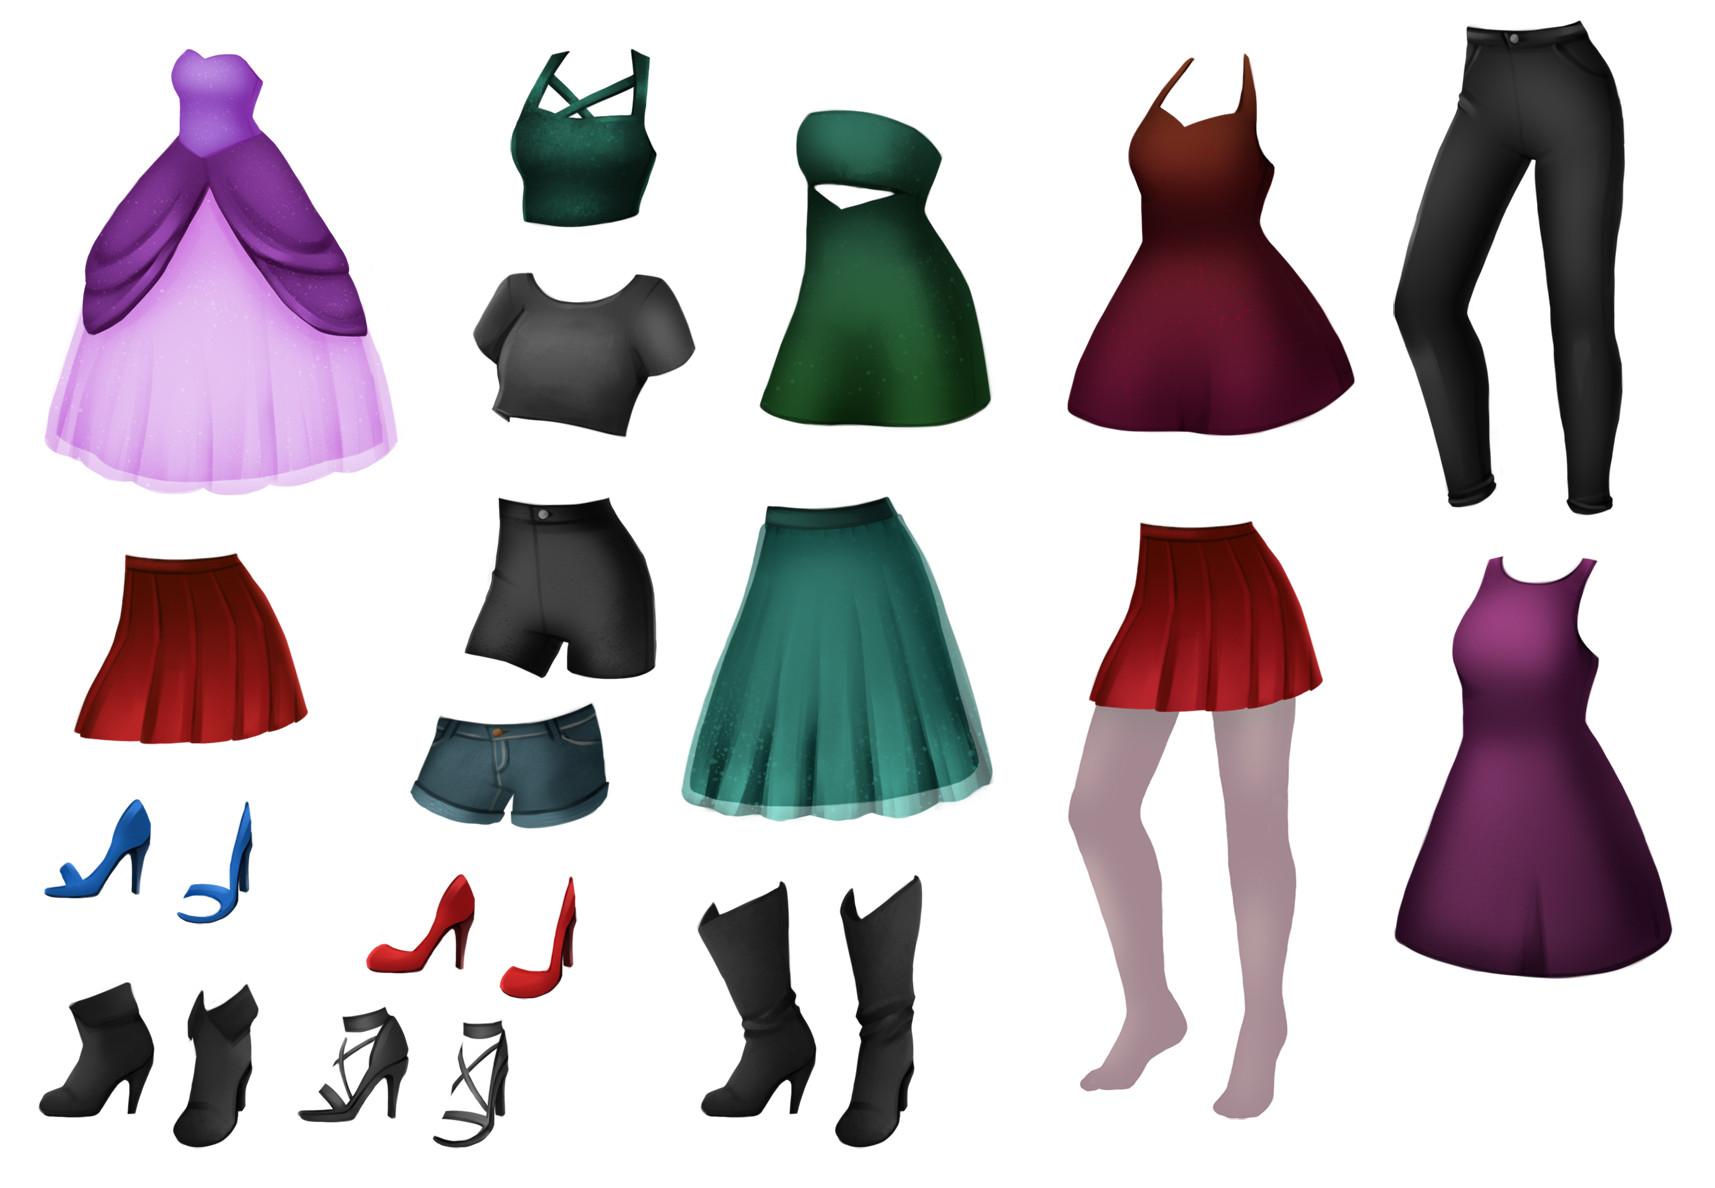 Megan sunnucks clothes